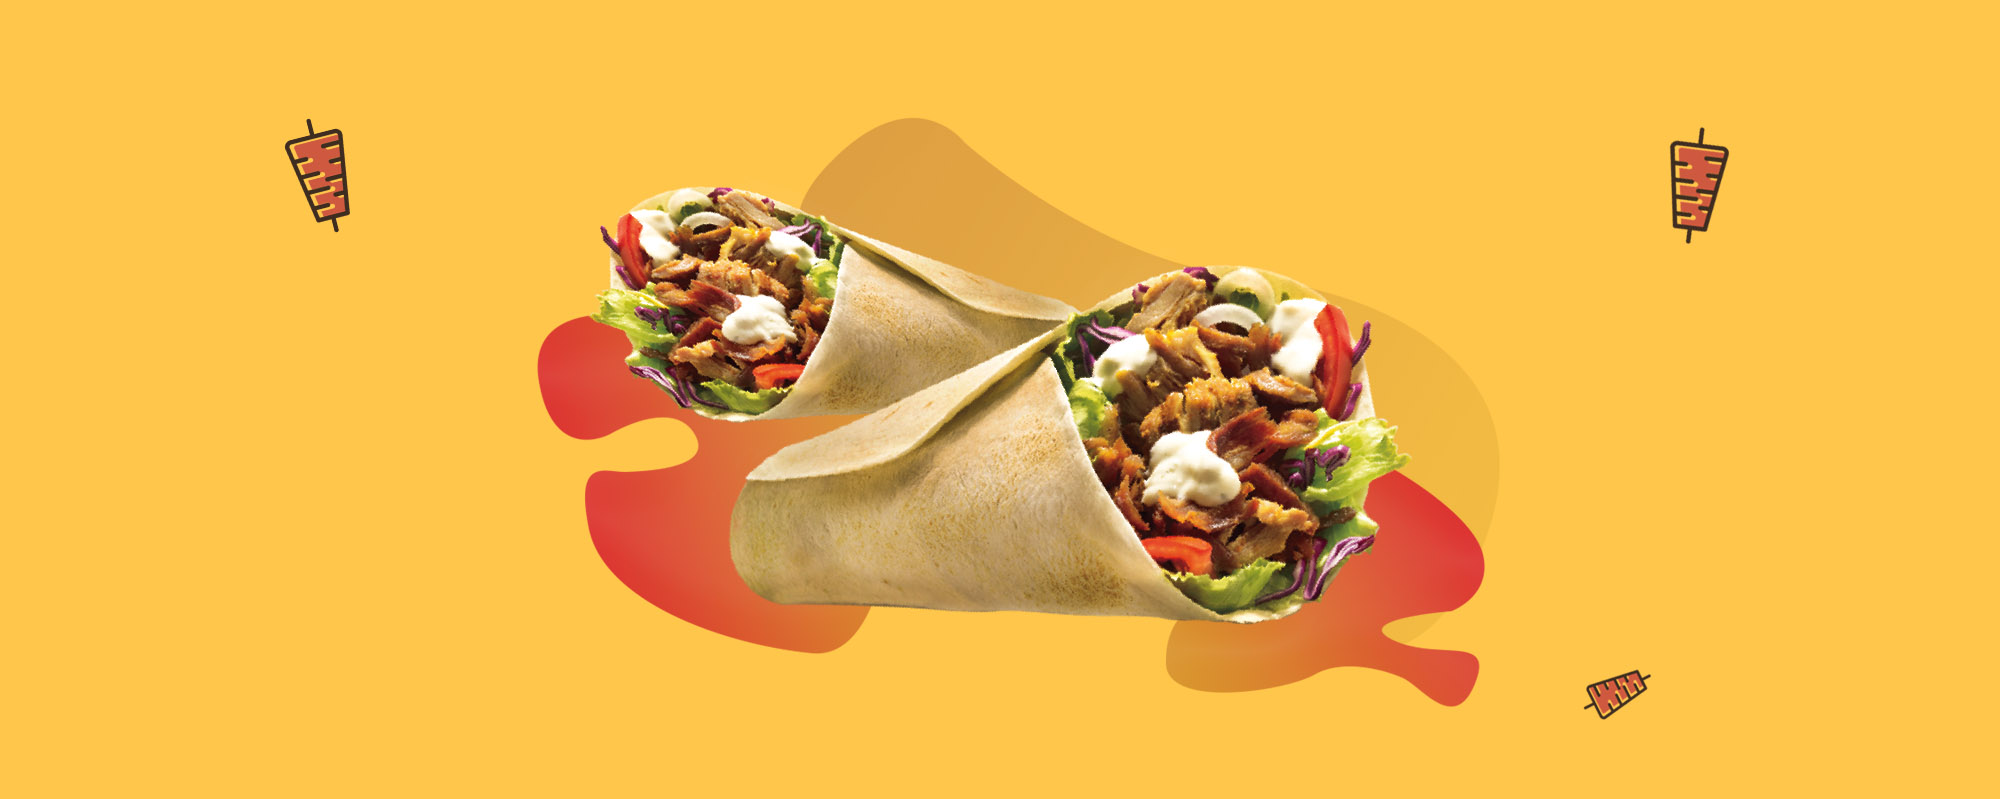 Kebab banner